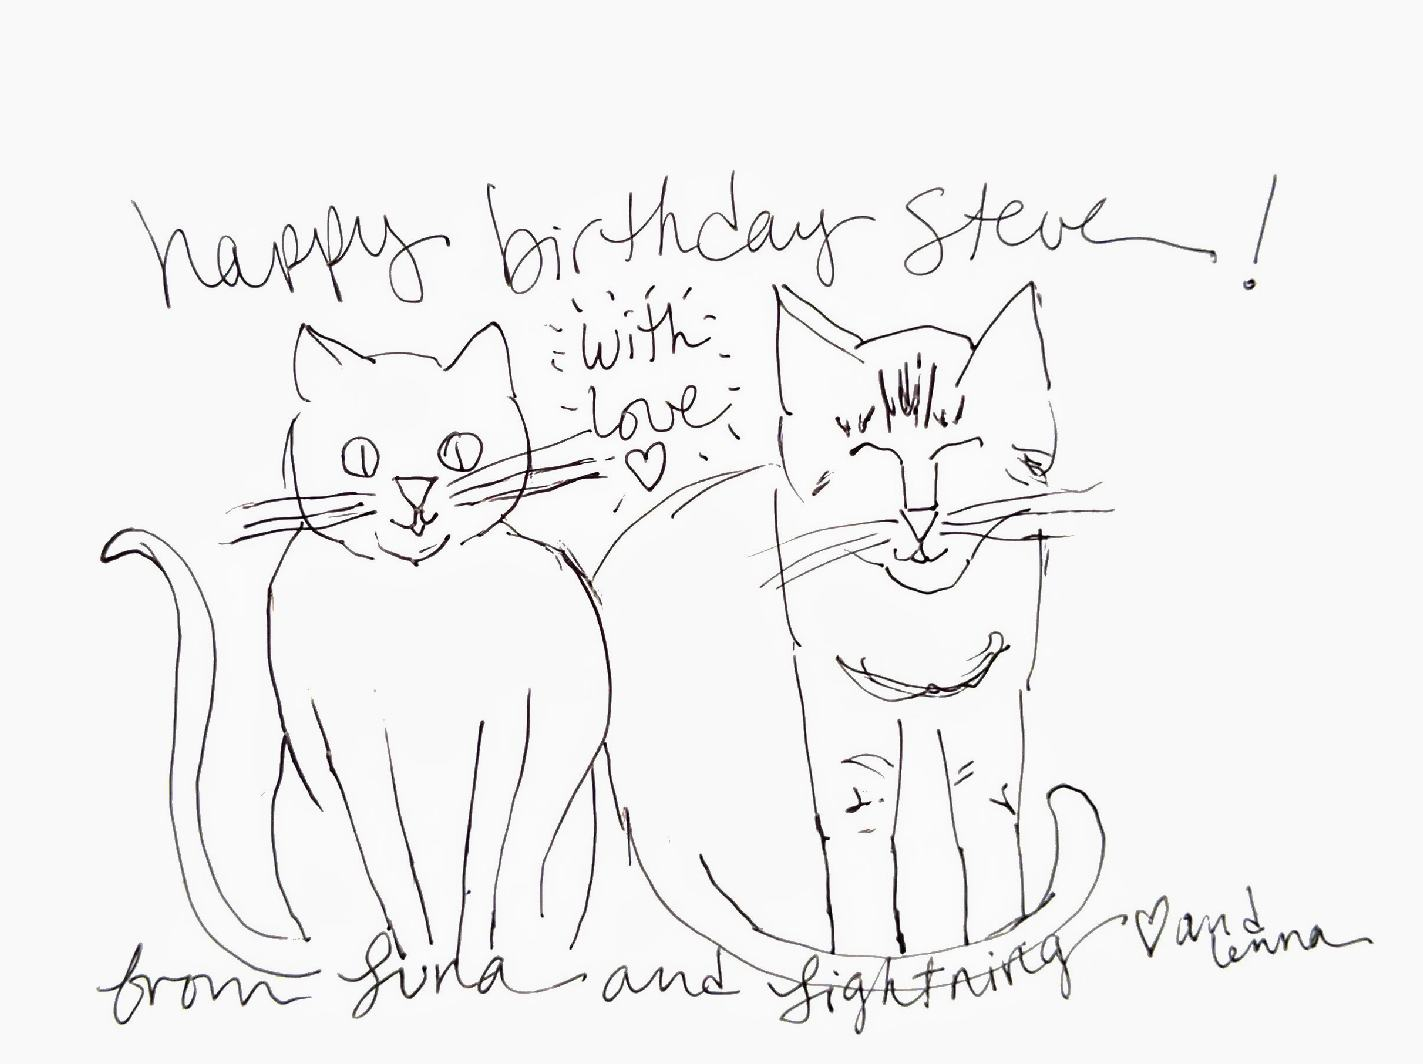 75: Happy Birthday Steve!